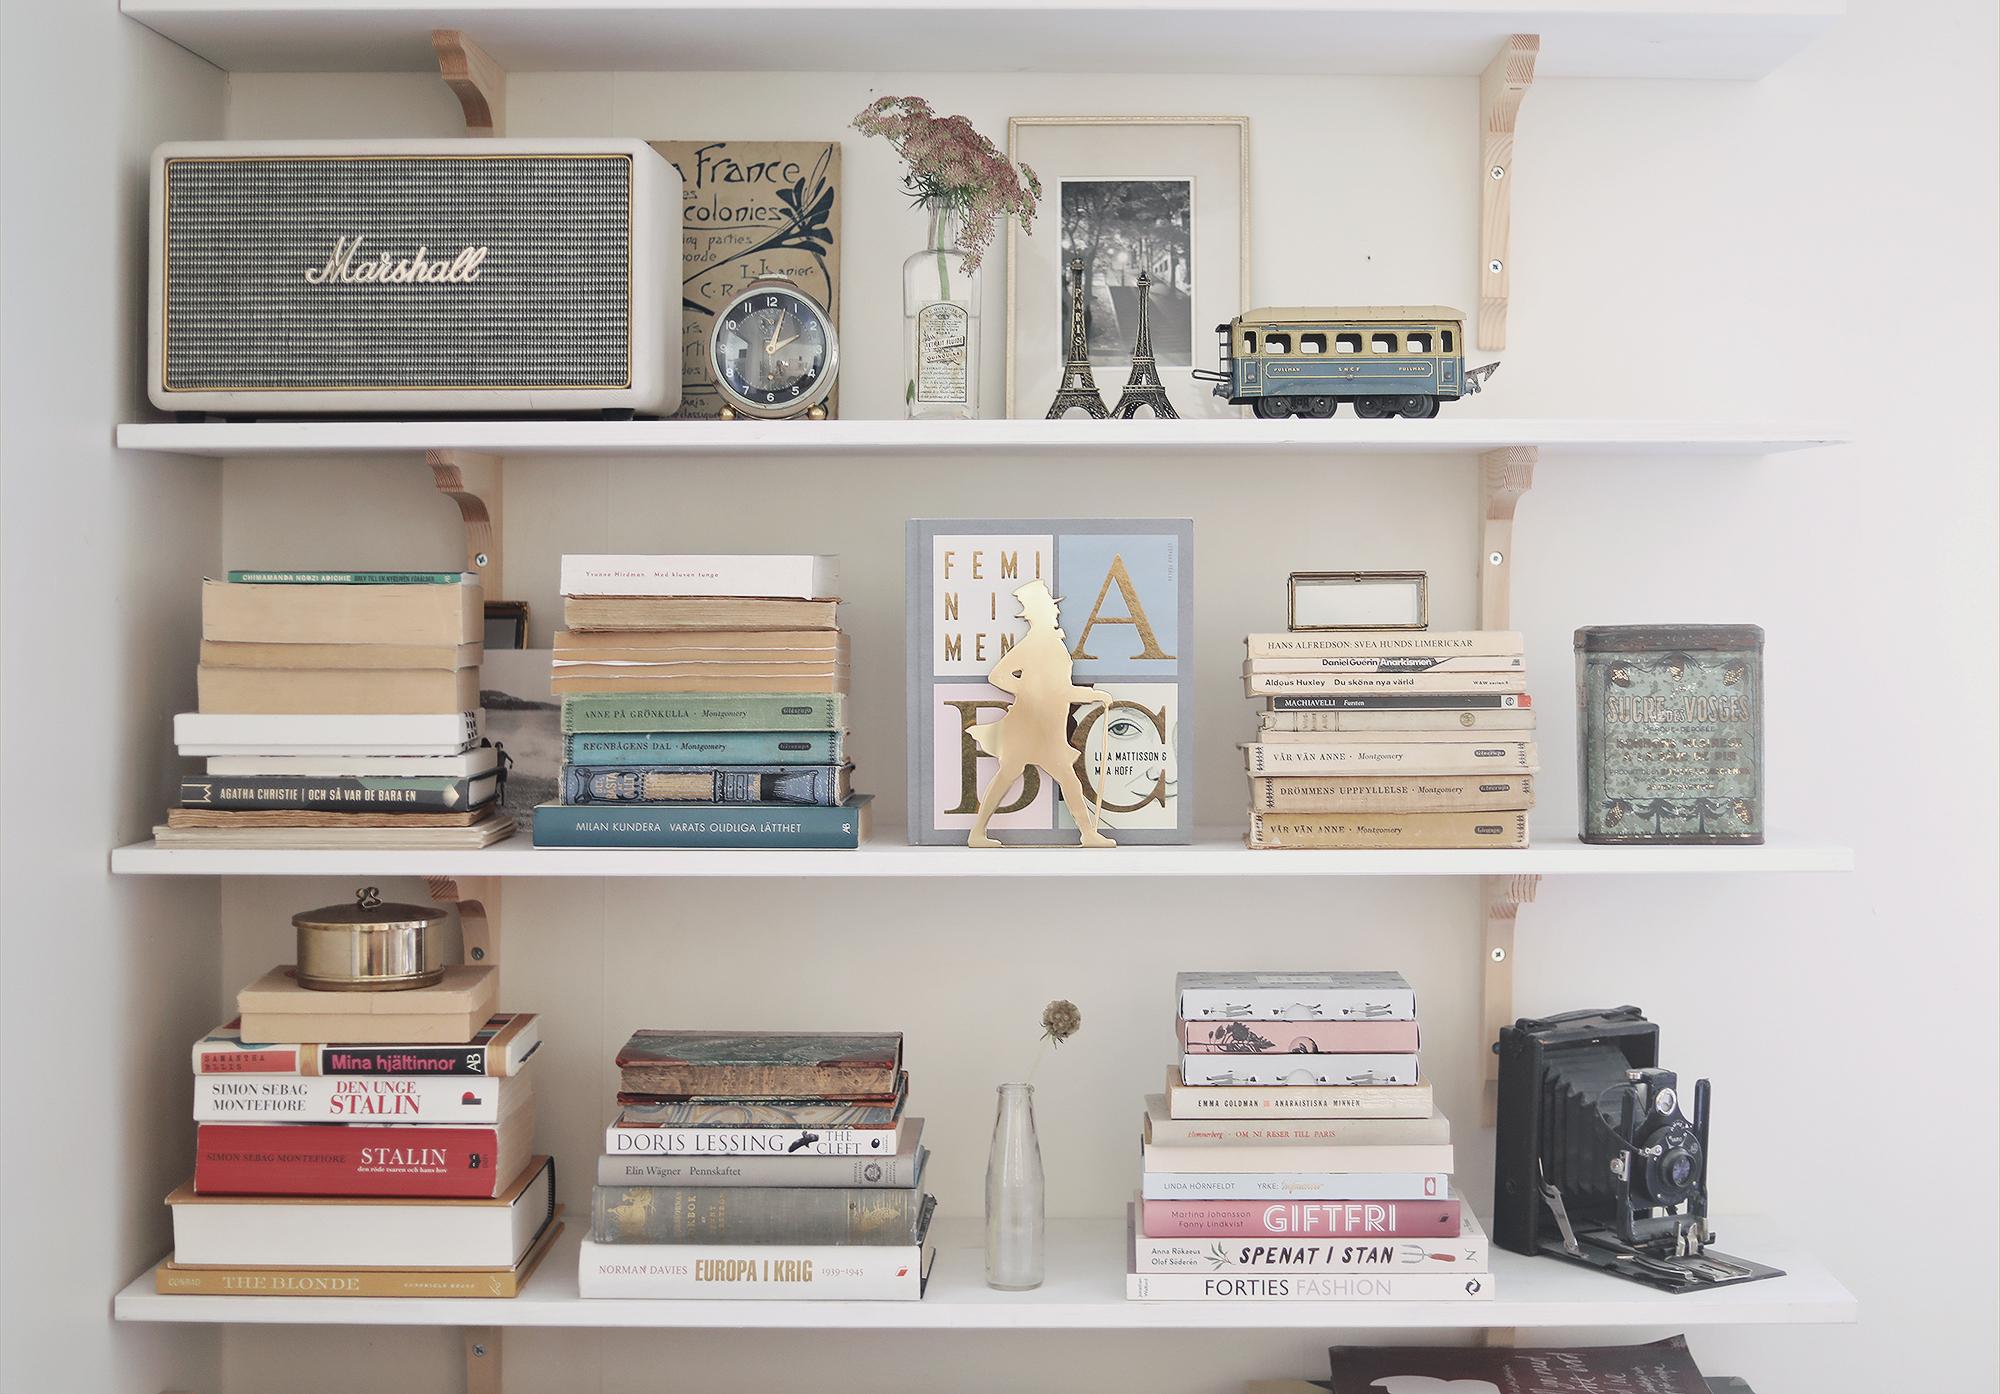 bokhylla bookshelf inredning interior books vintage Paris emmasvintage farbror blå Elsa beskow konsoler trä träkonsoler sekelskift